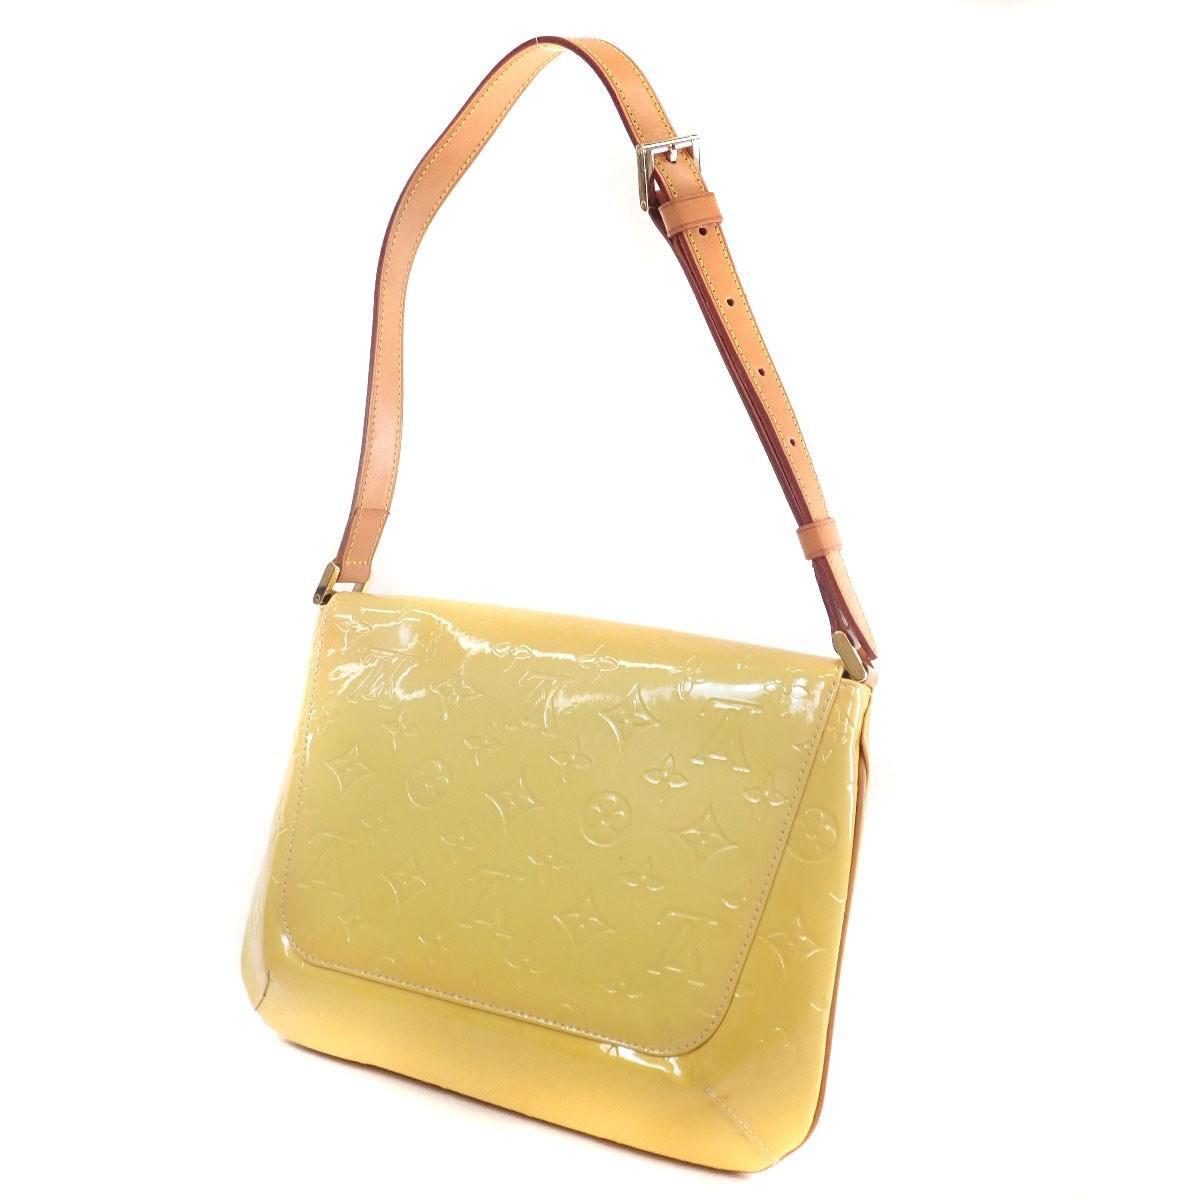 5acfeb22e771 Lyst - Louis Vuitton Vernis Shoulder Bag M91008 Thompson Street in ...